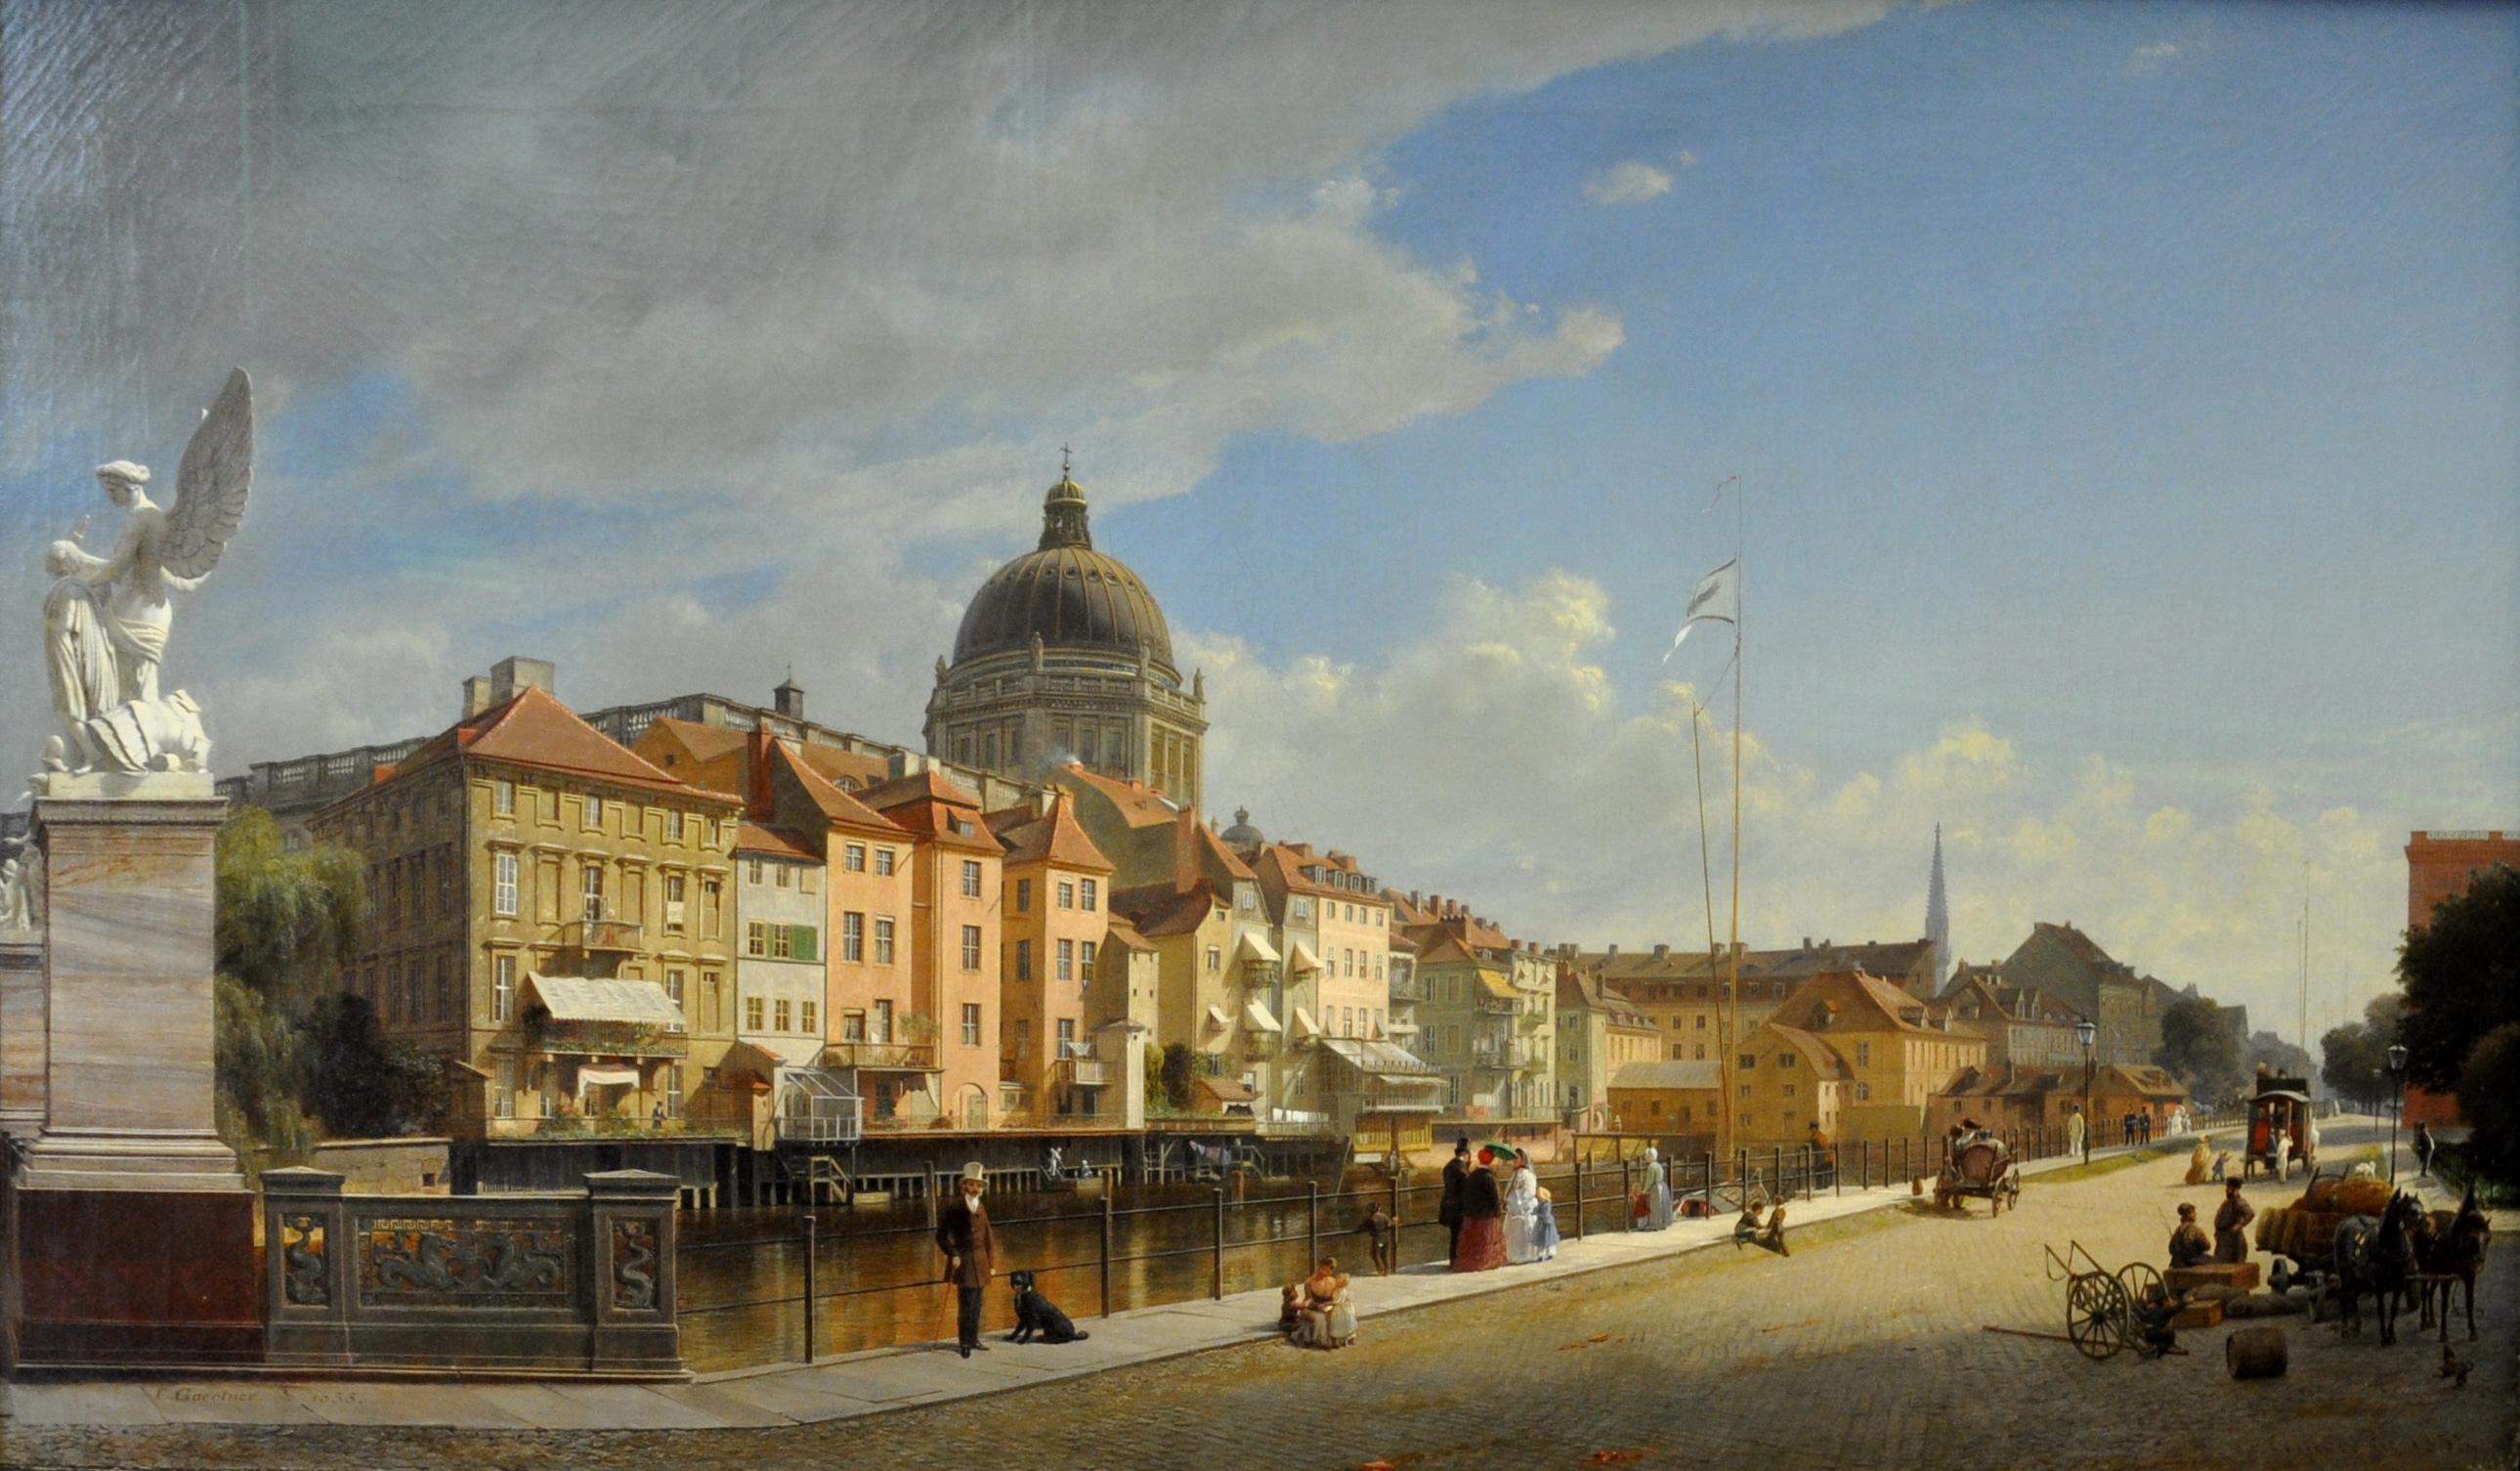 Eduard_Gaertner_Schlossfreiheit_1855.jpg